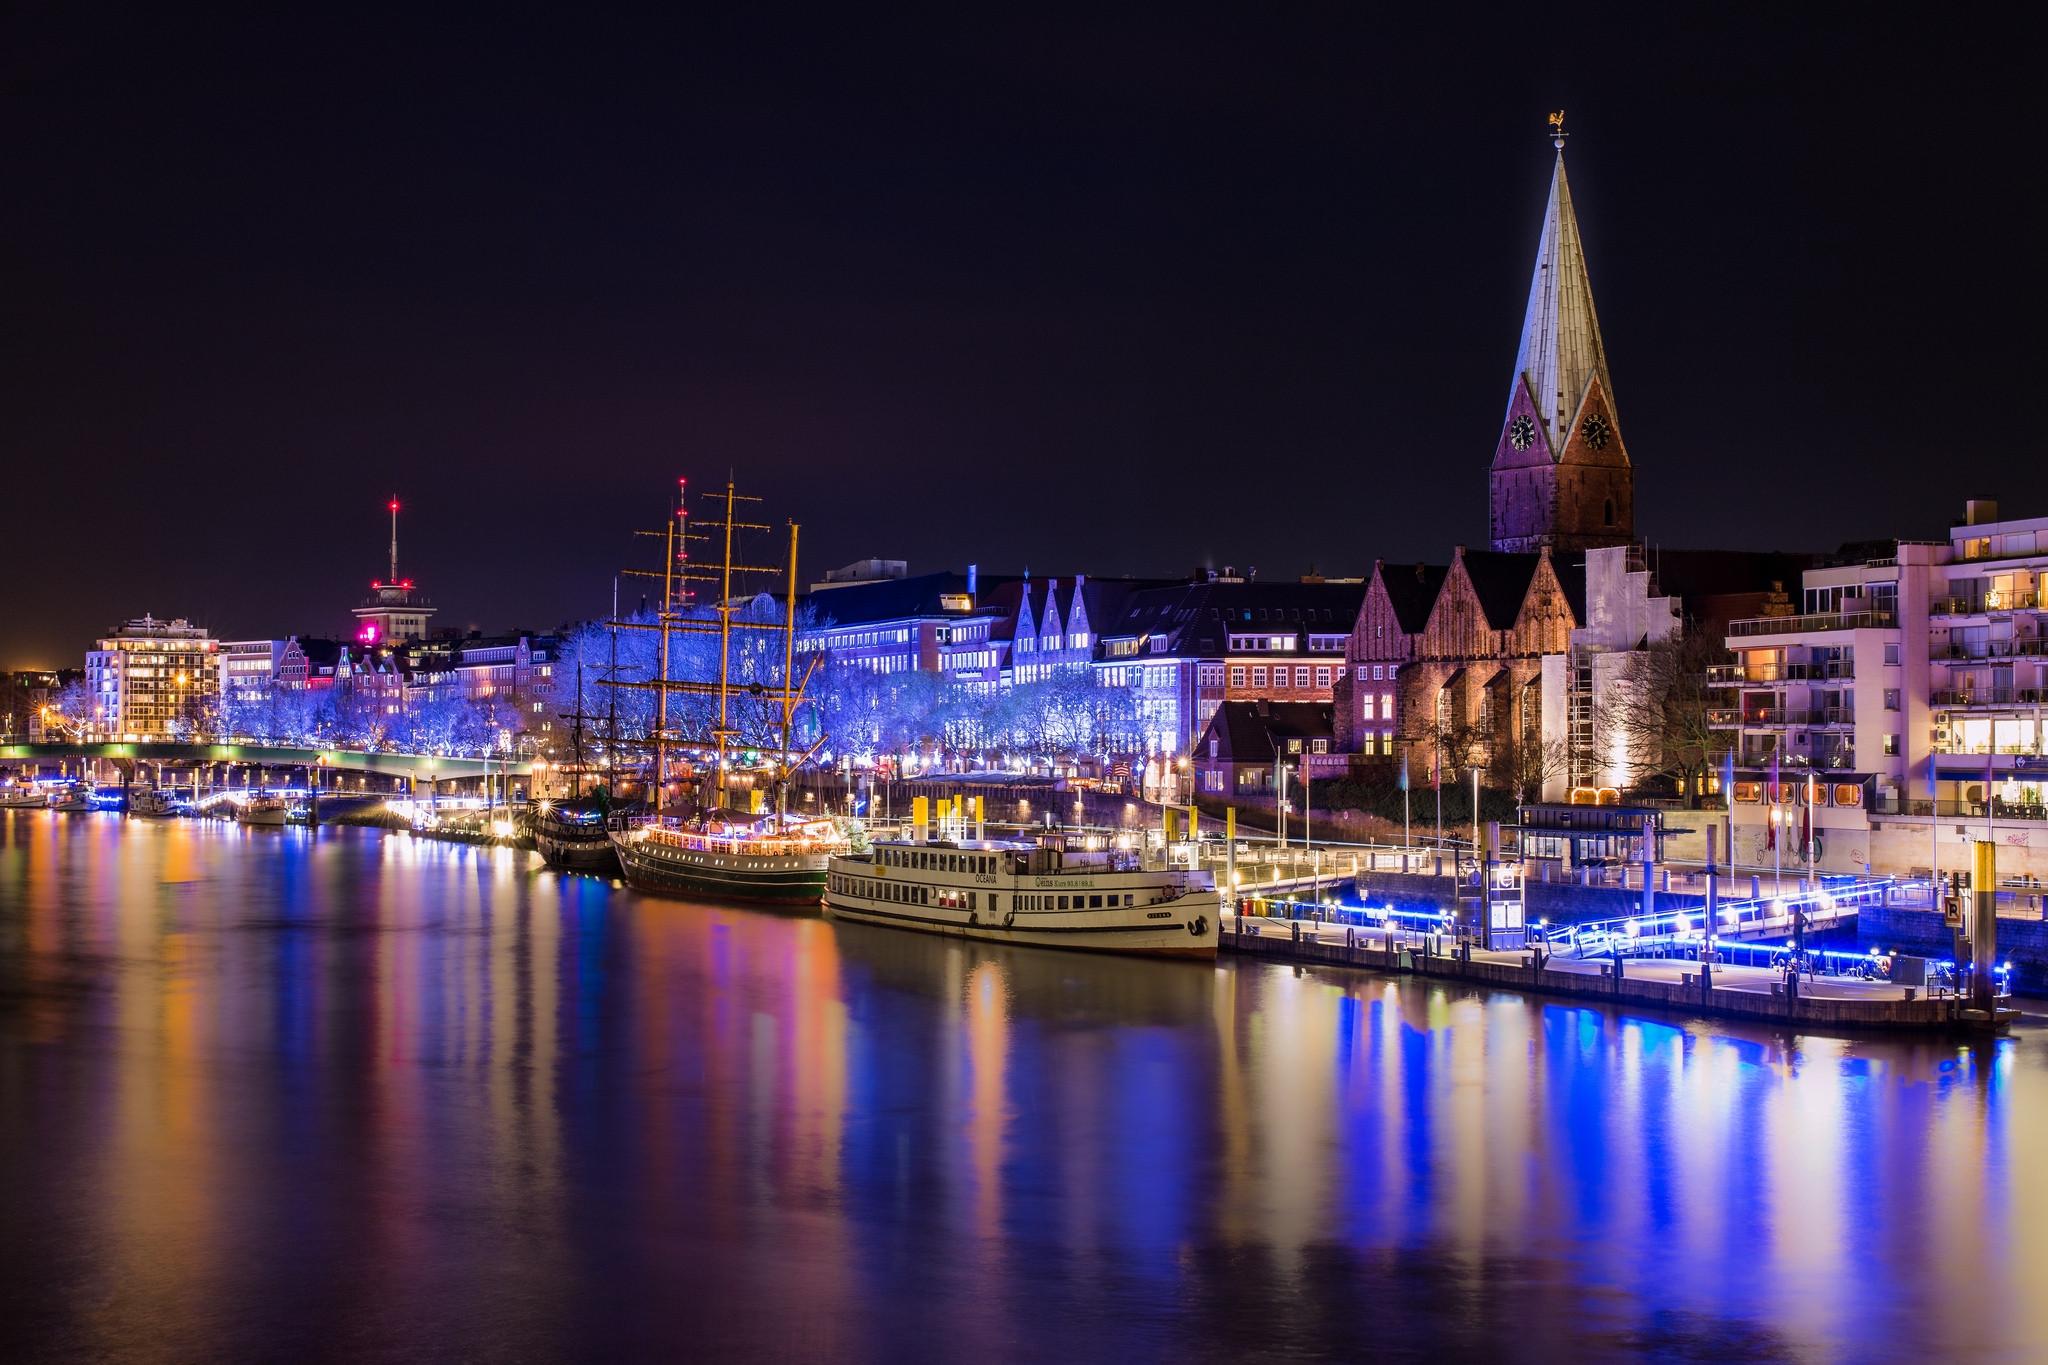 обои Бремен, Германия, город, ночь картинки фото